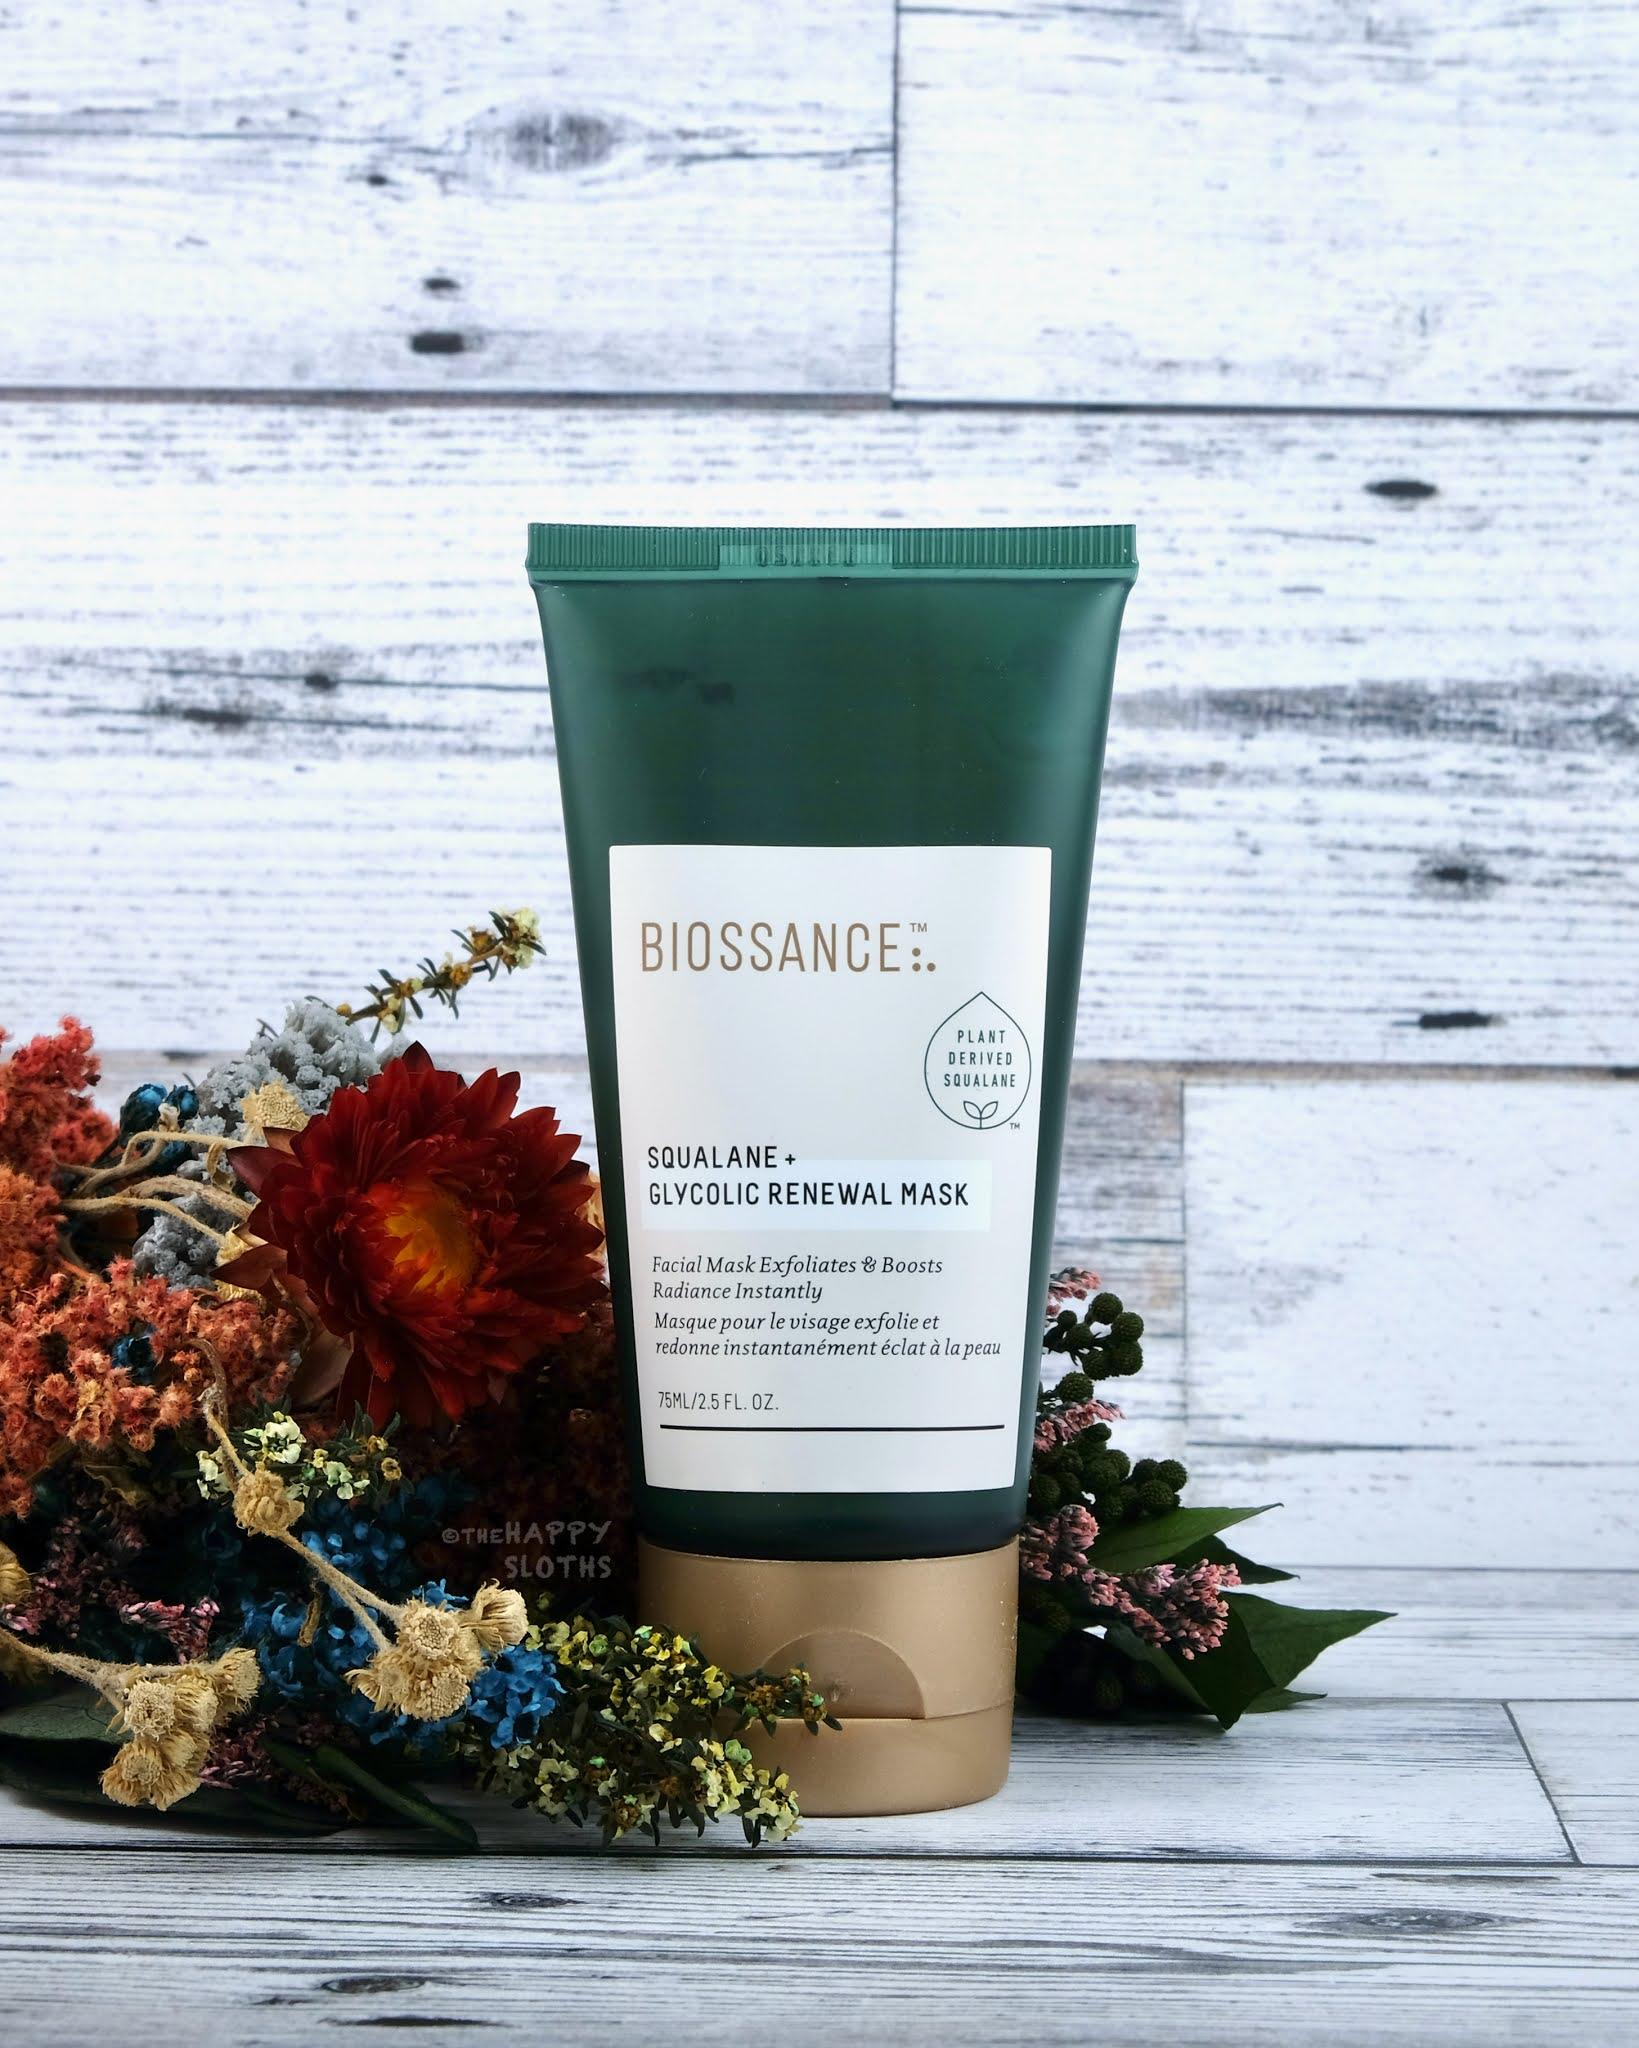 Biossance | Squalane + Glycolic Renewal Mask: Review